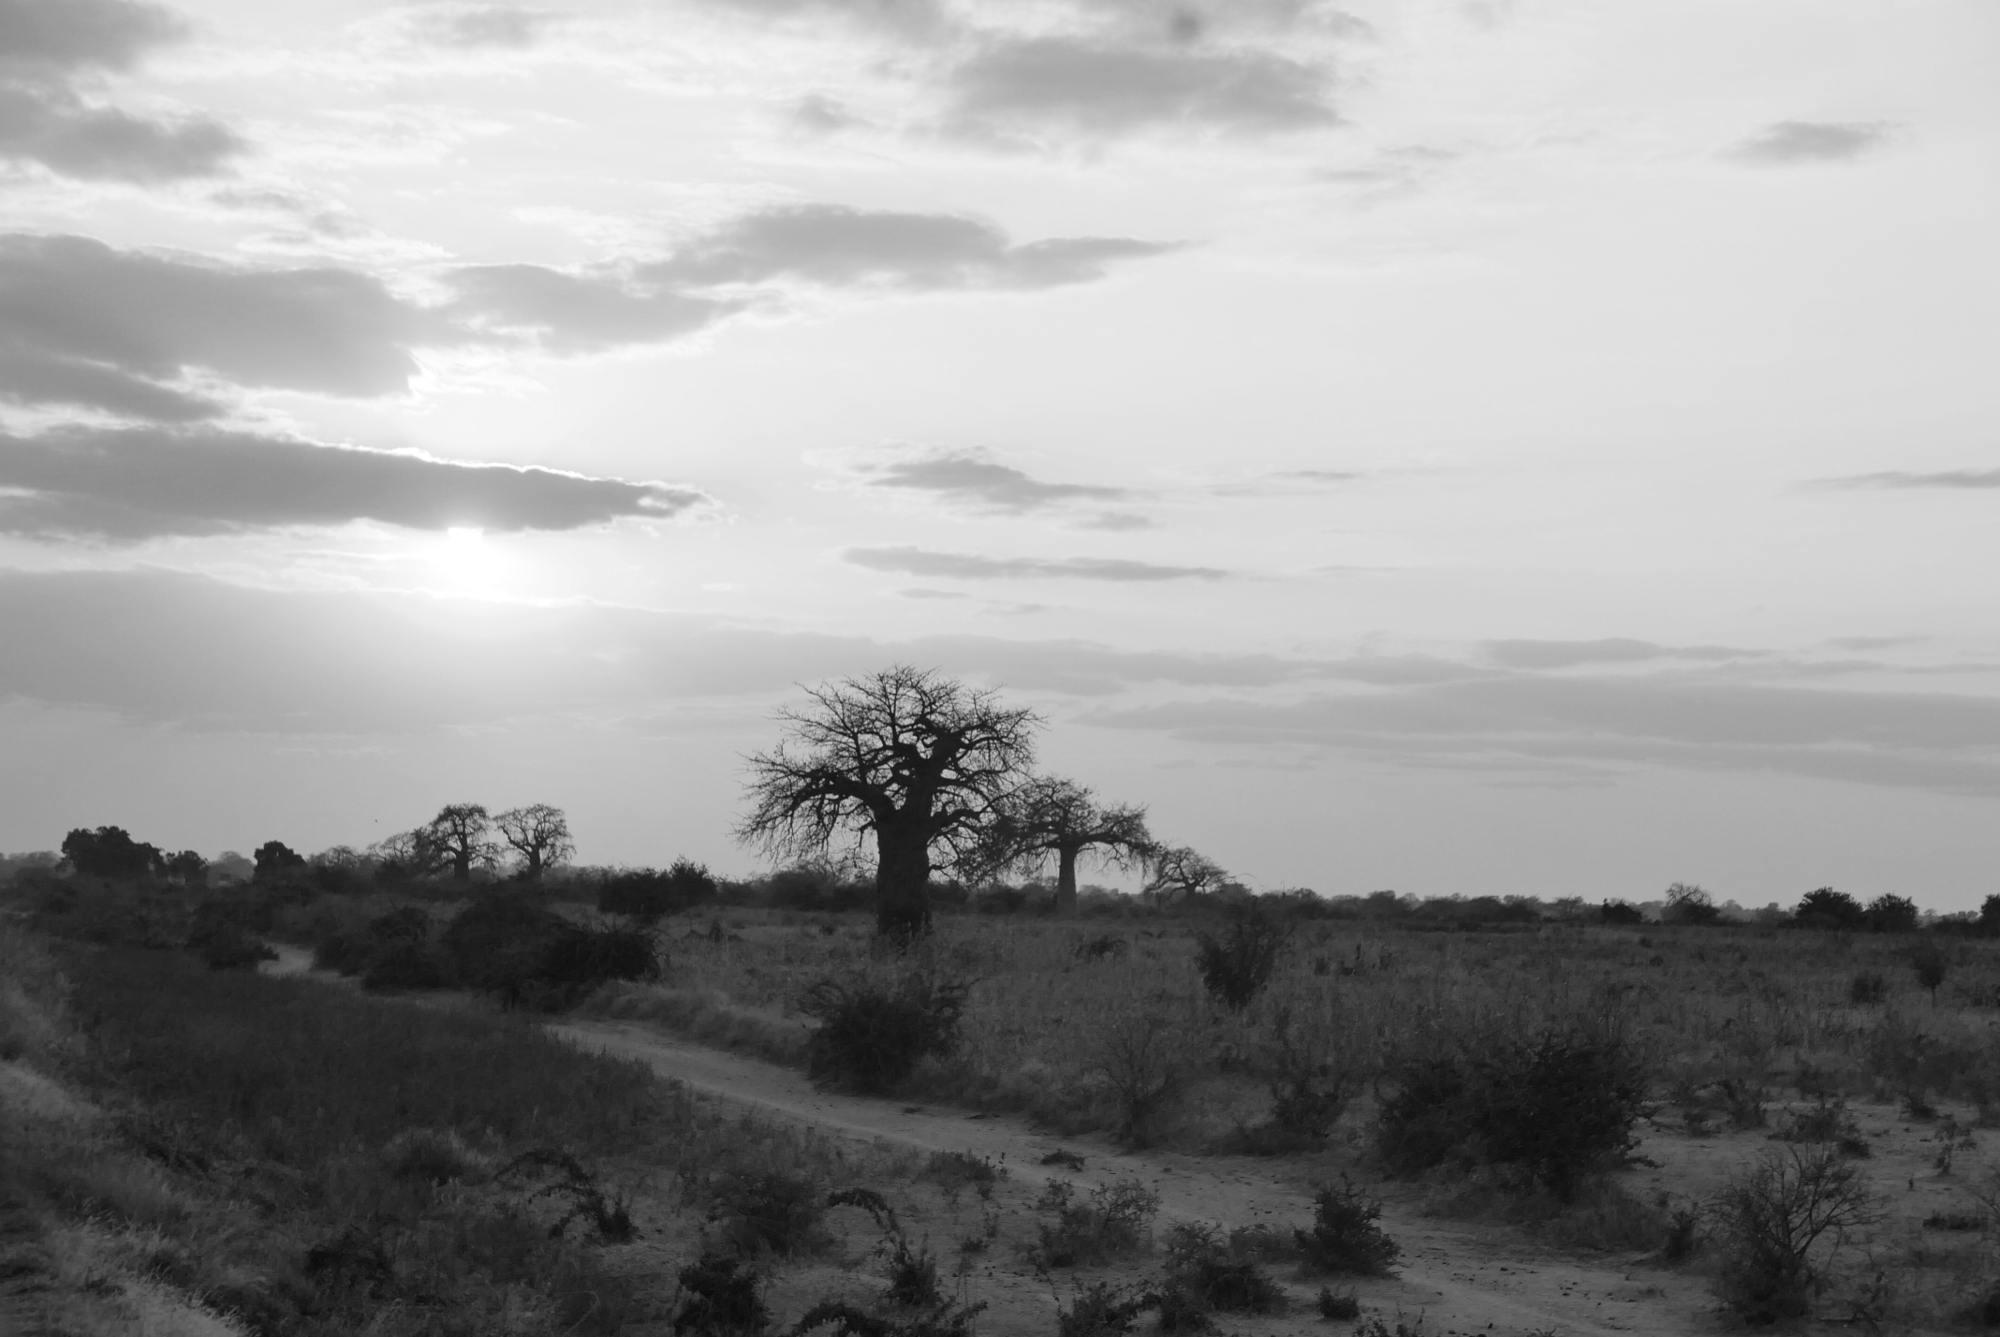 Landscape near Dodoma